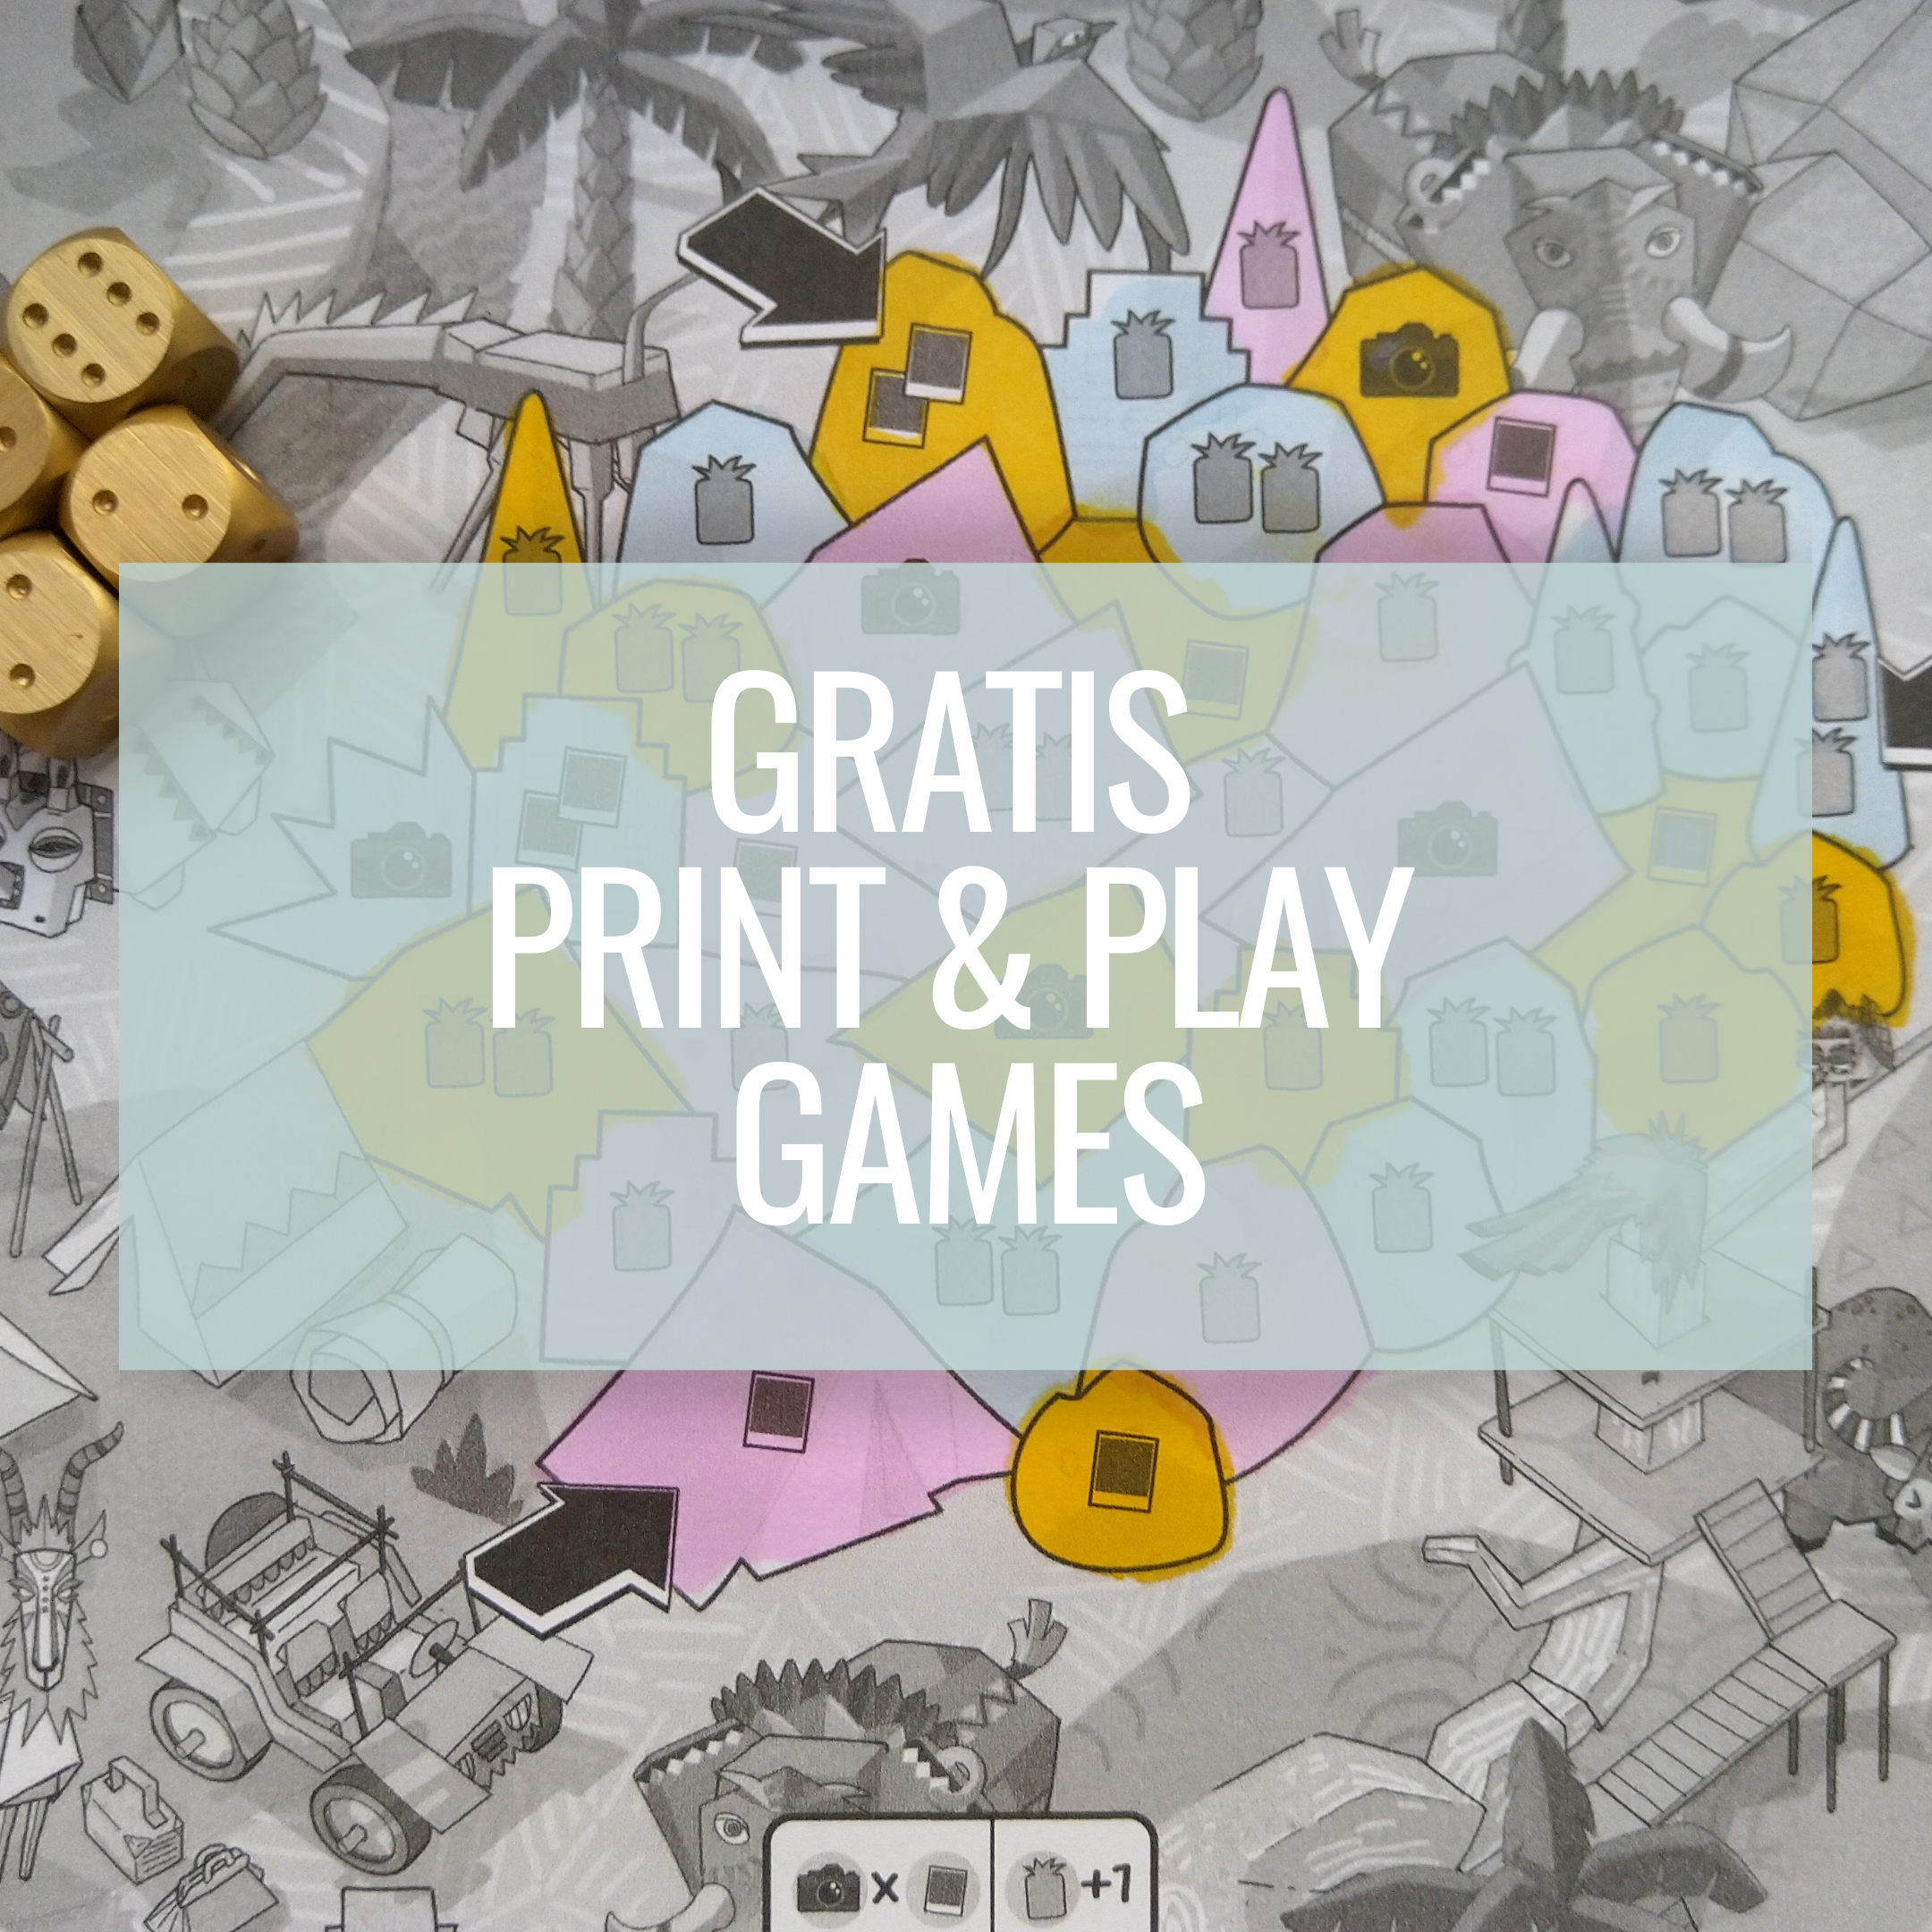 gratis print and play games